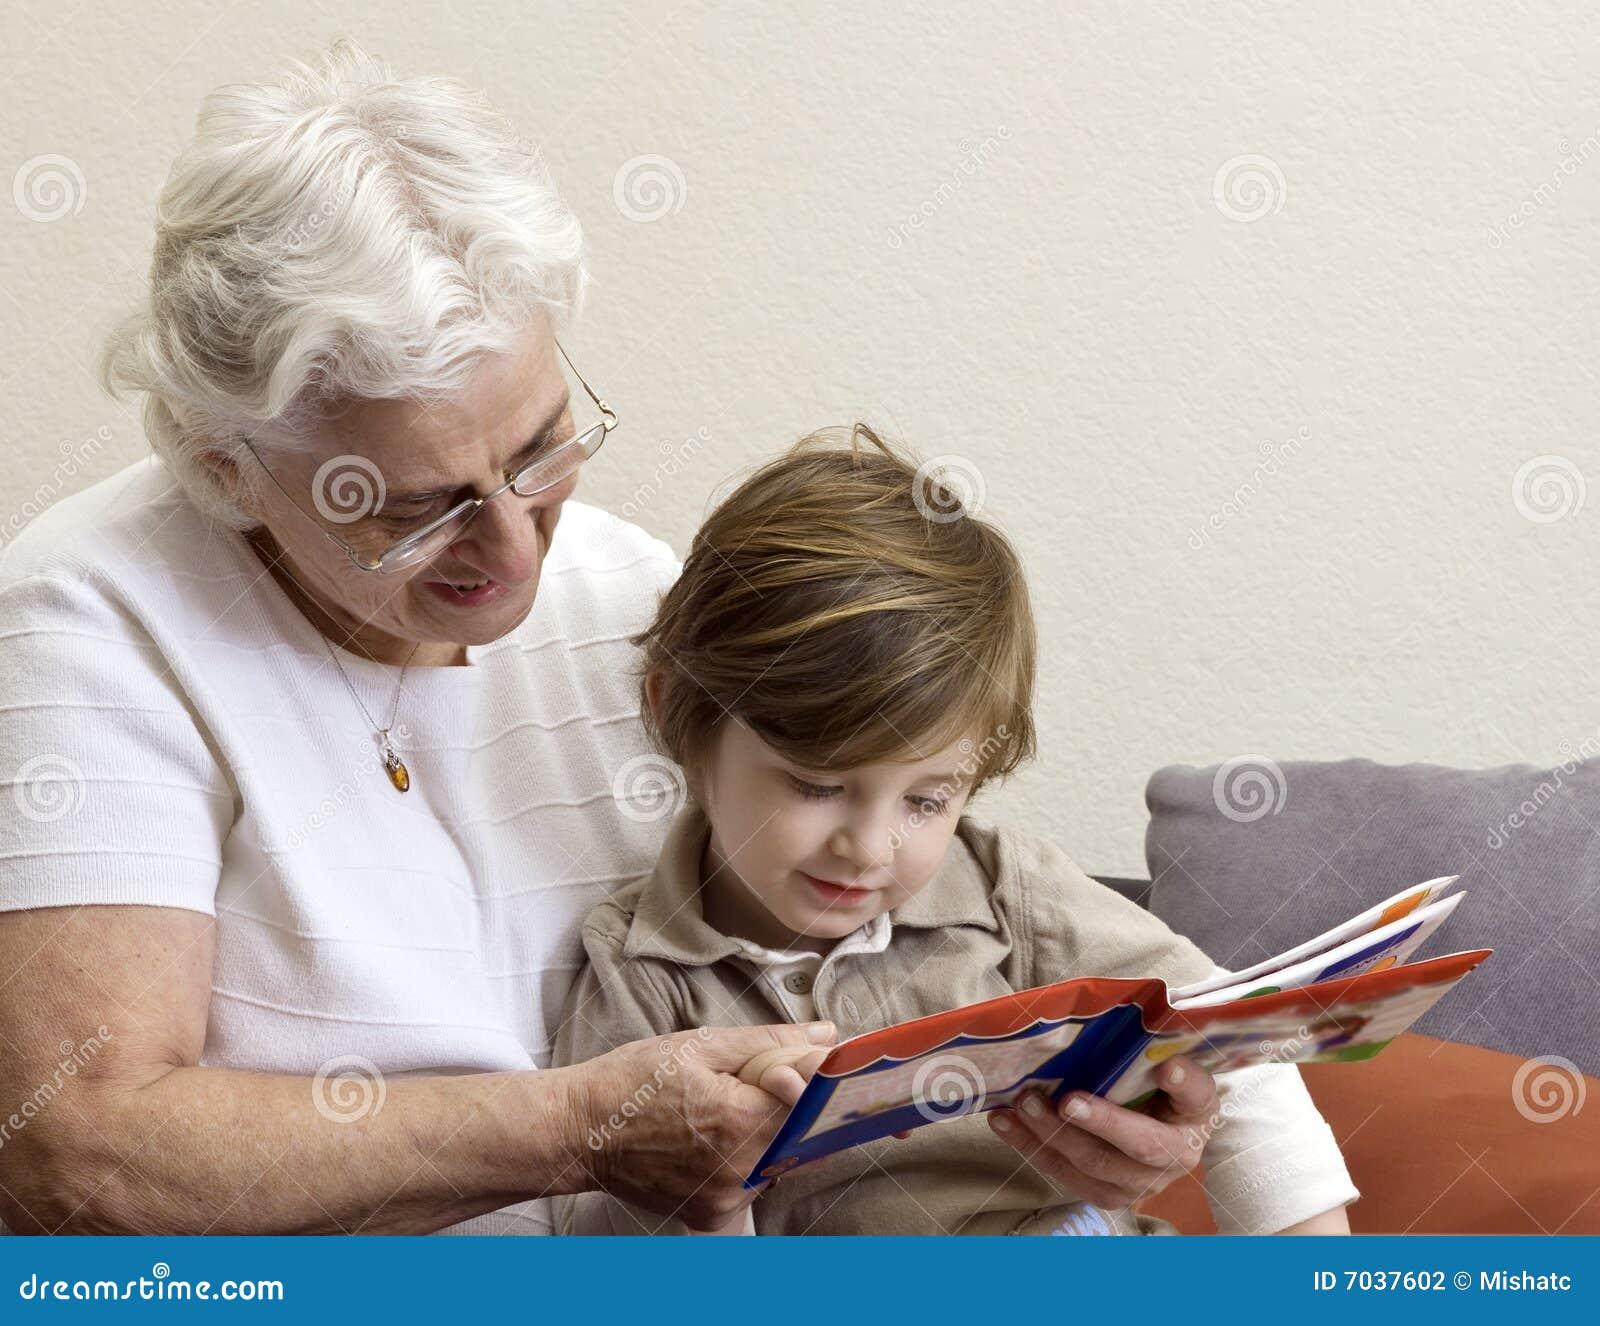 grandmas and grandson nude